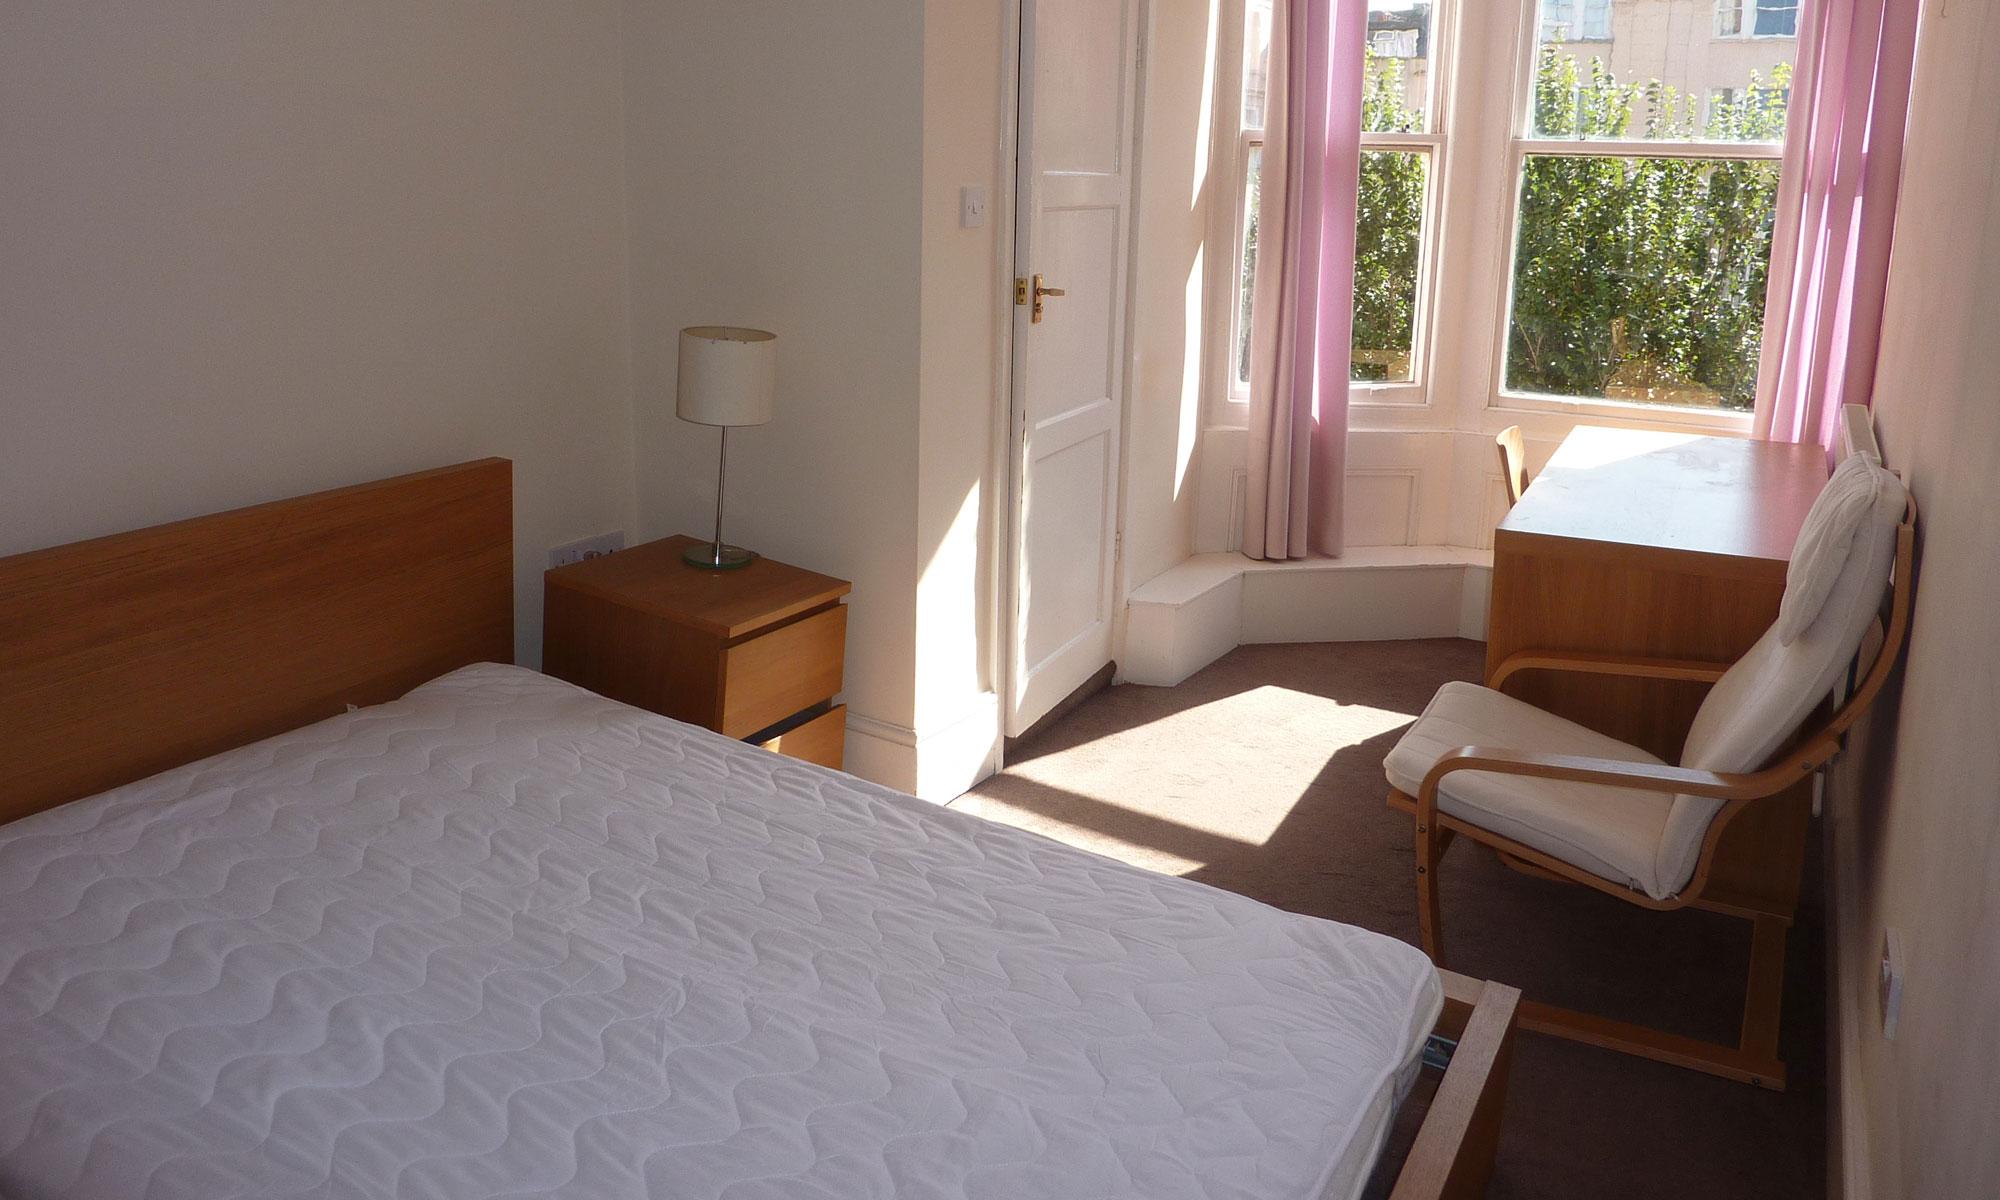 Bedford-square-bedroom-4